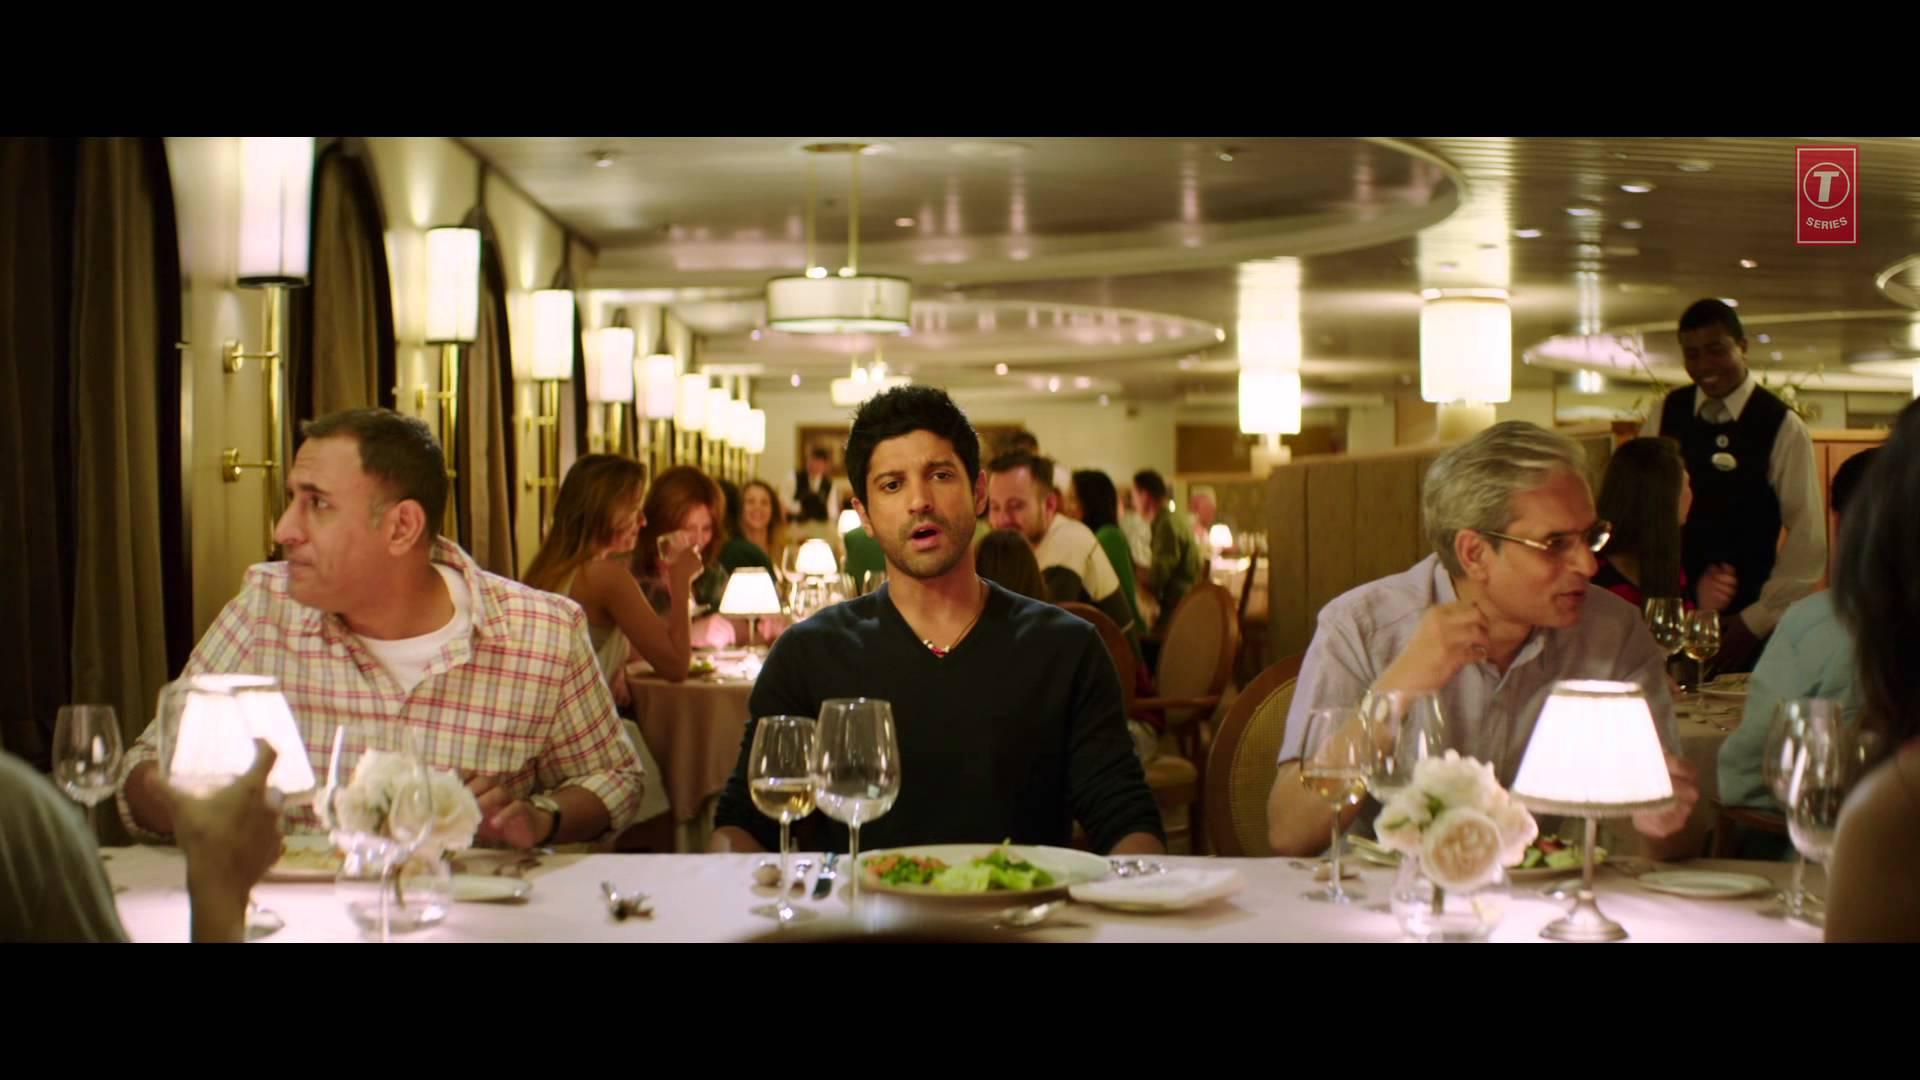 Phir Bhi Yeh Zindagi Video Song – Dil Dhadakne Do | Official Video Song